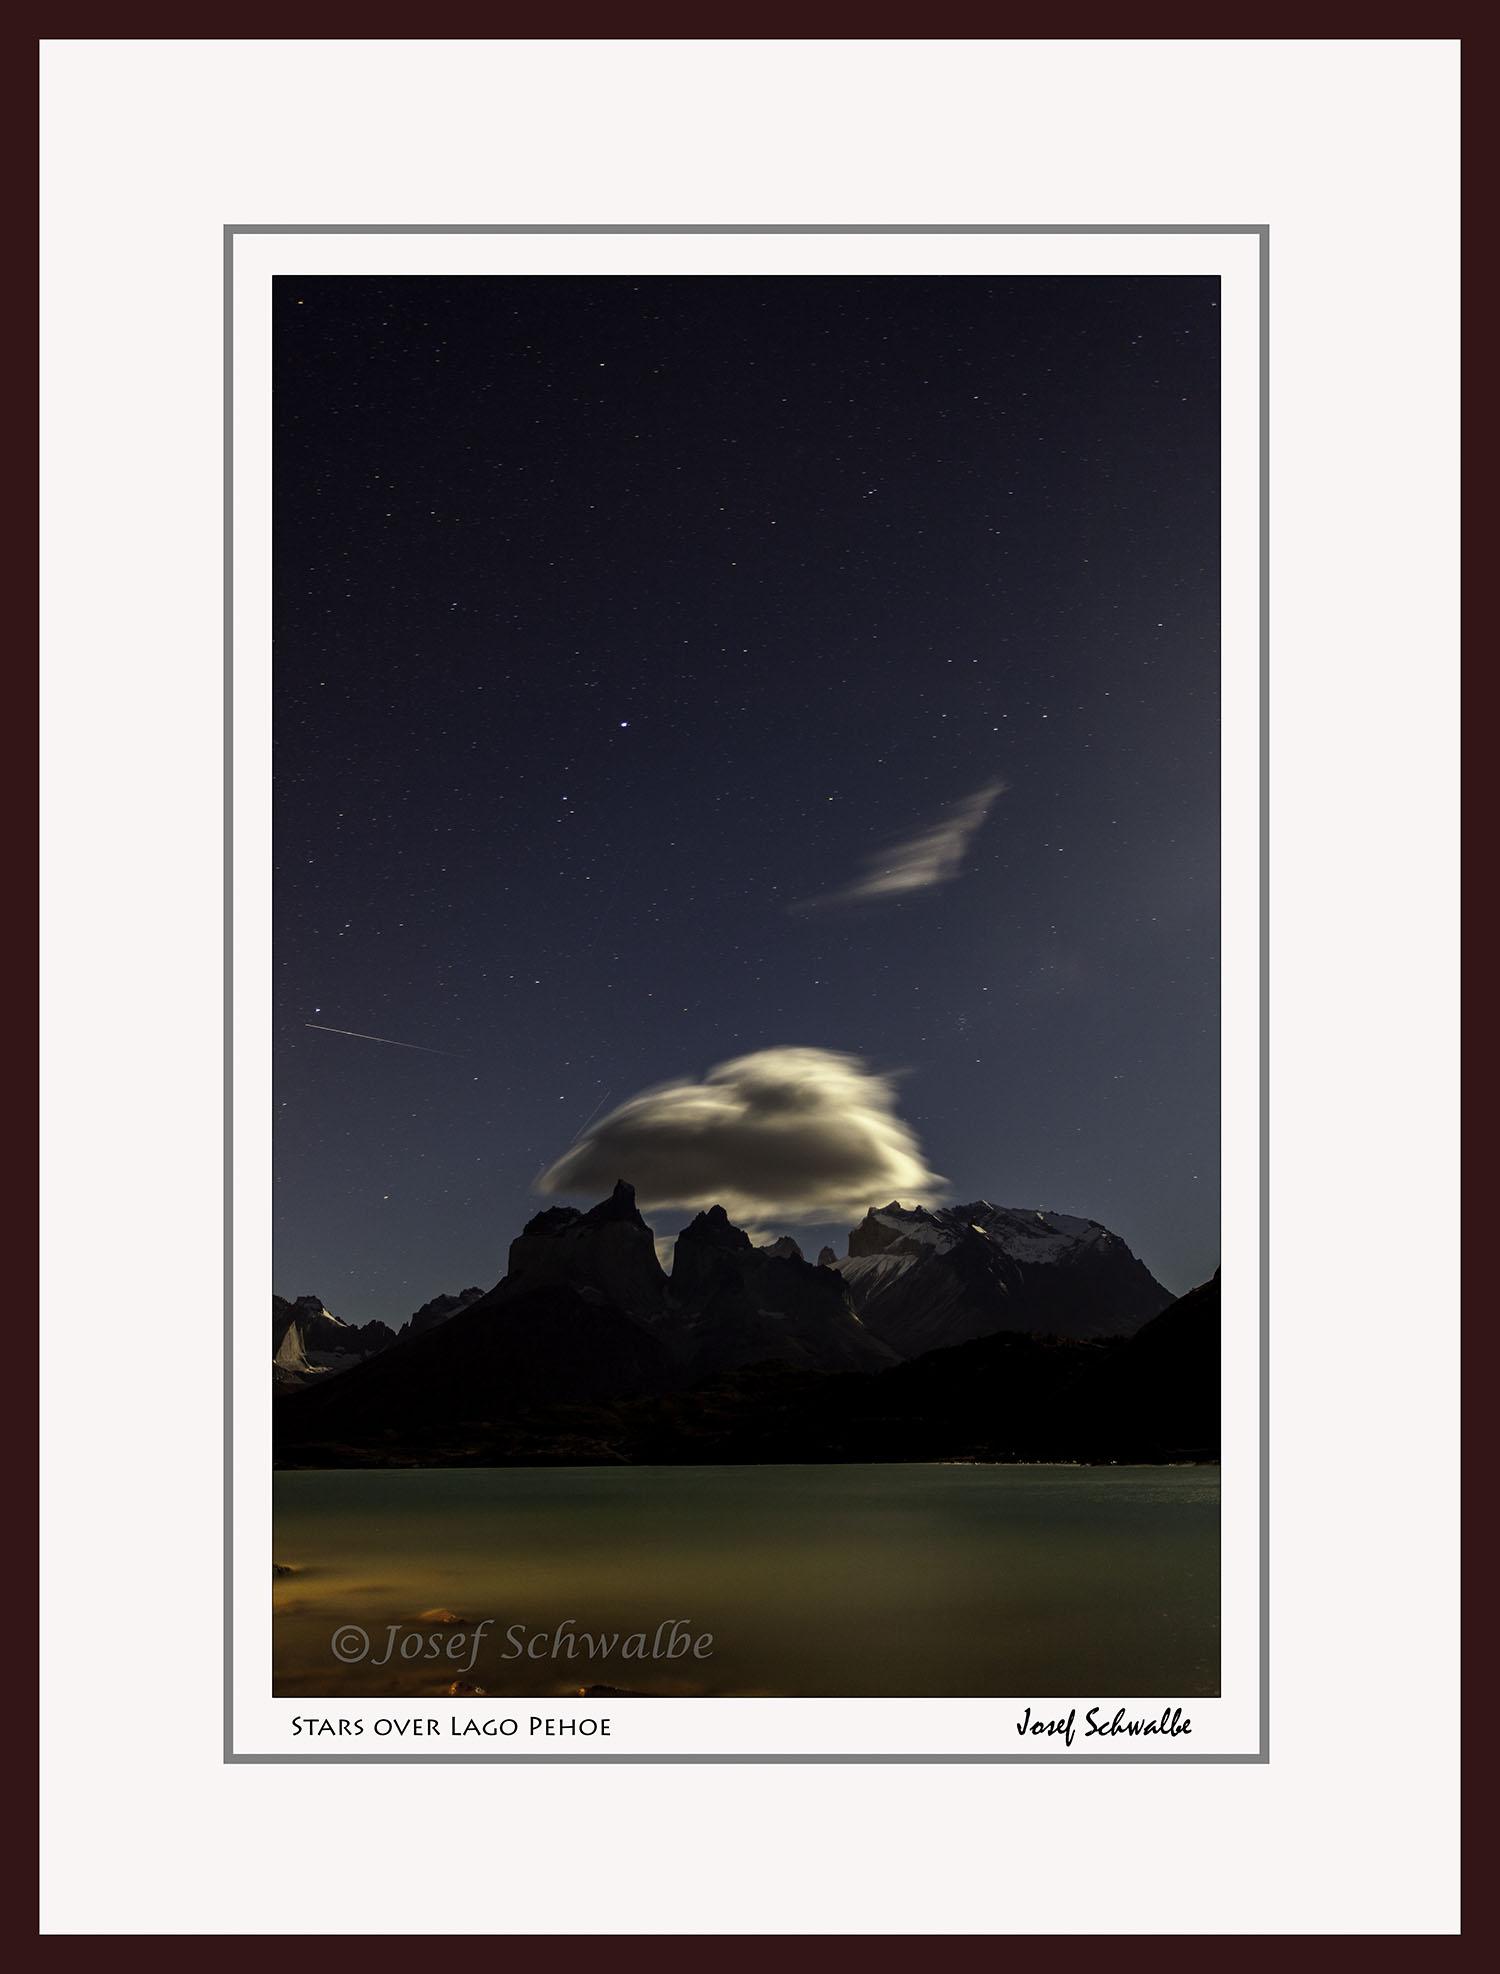 Stars over Lago Pehoe